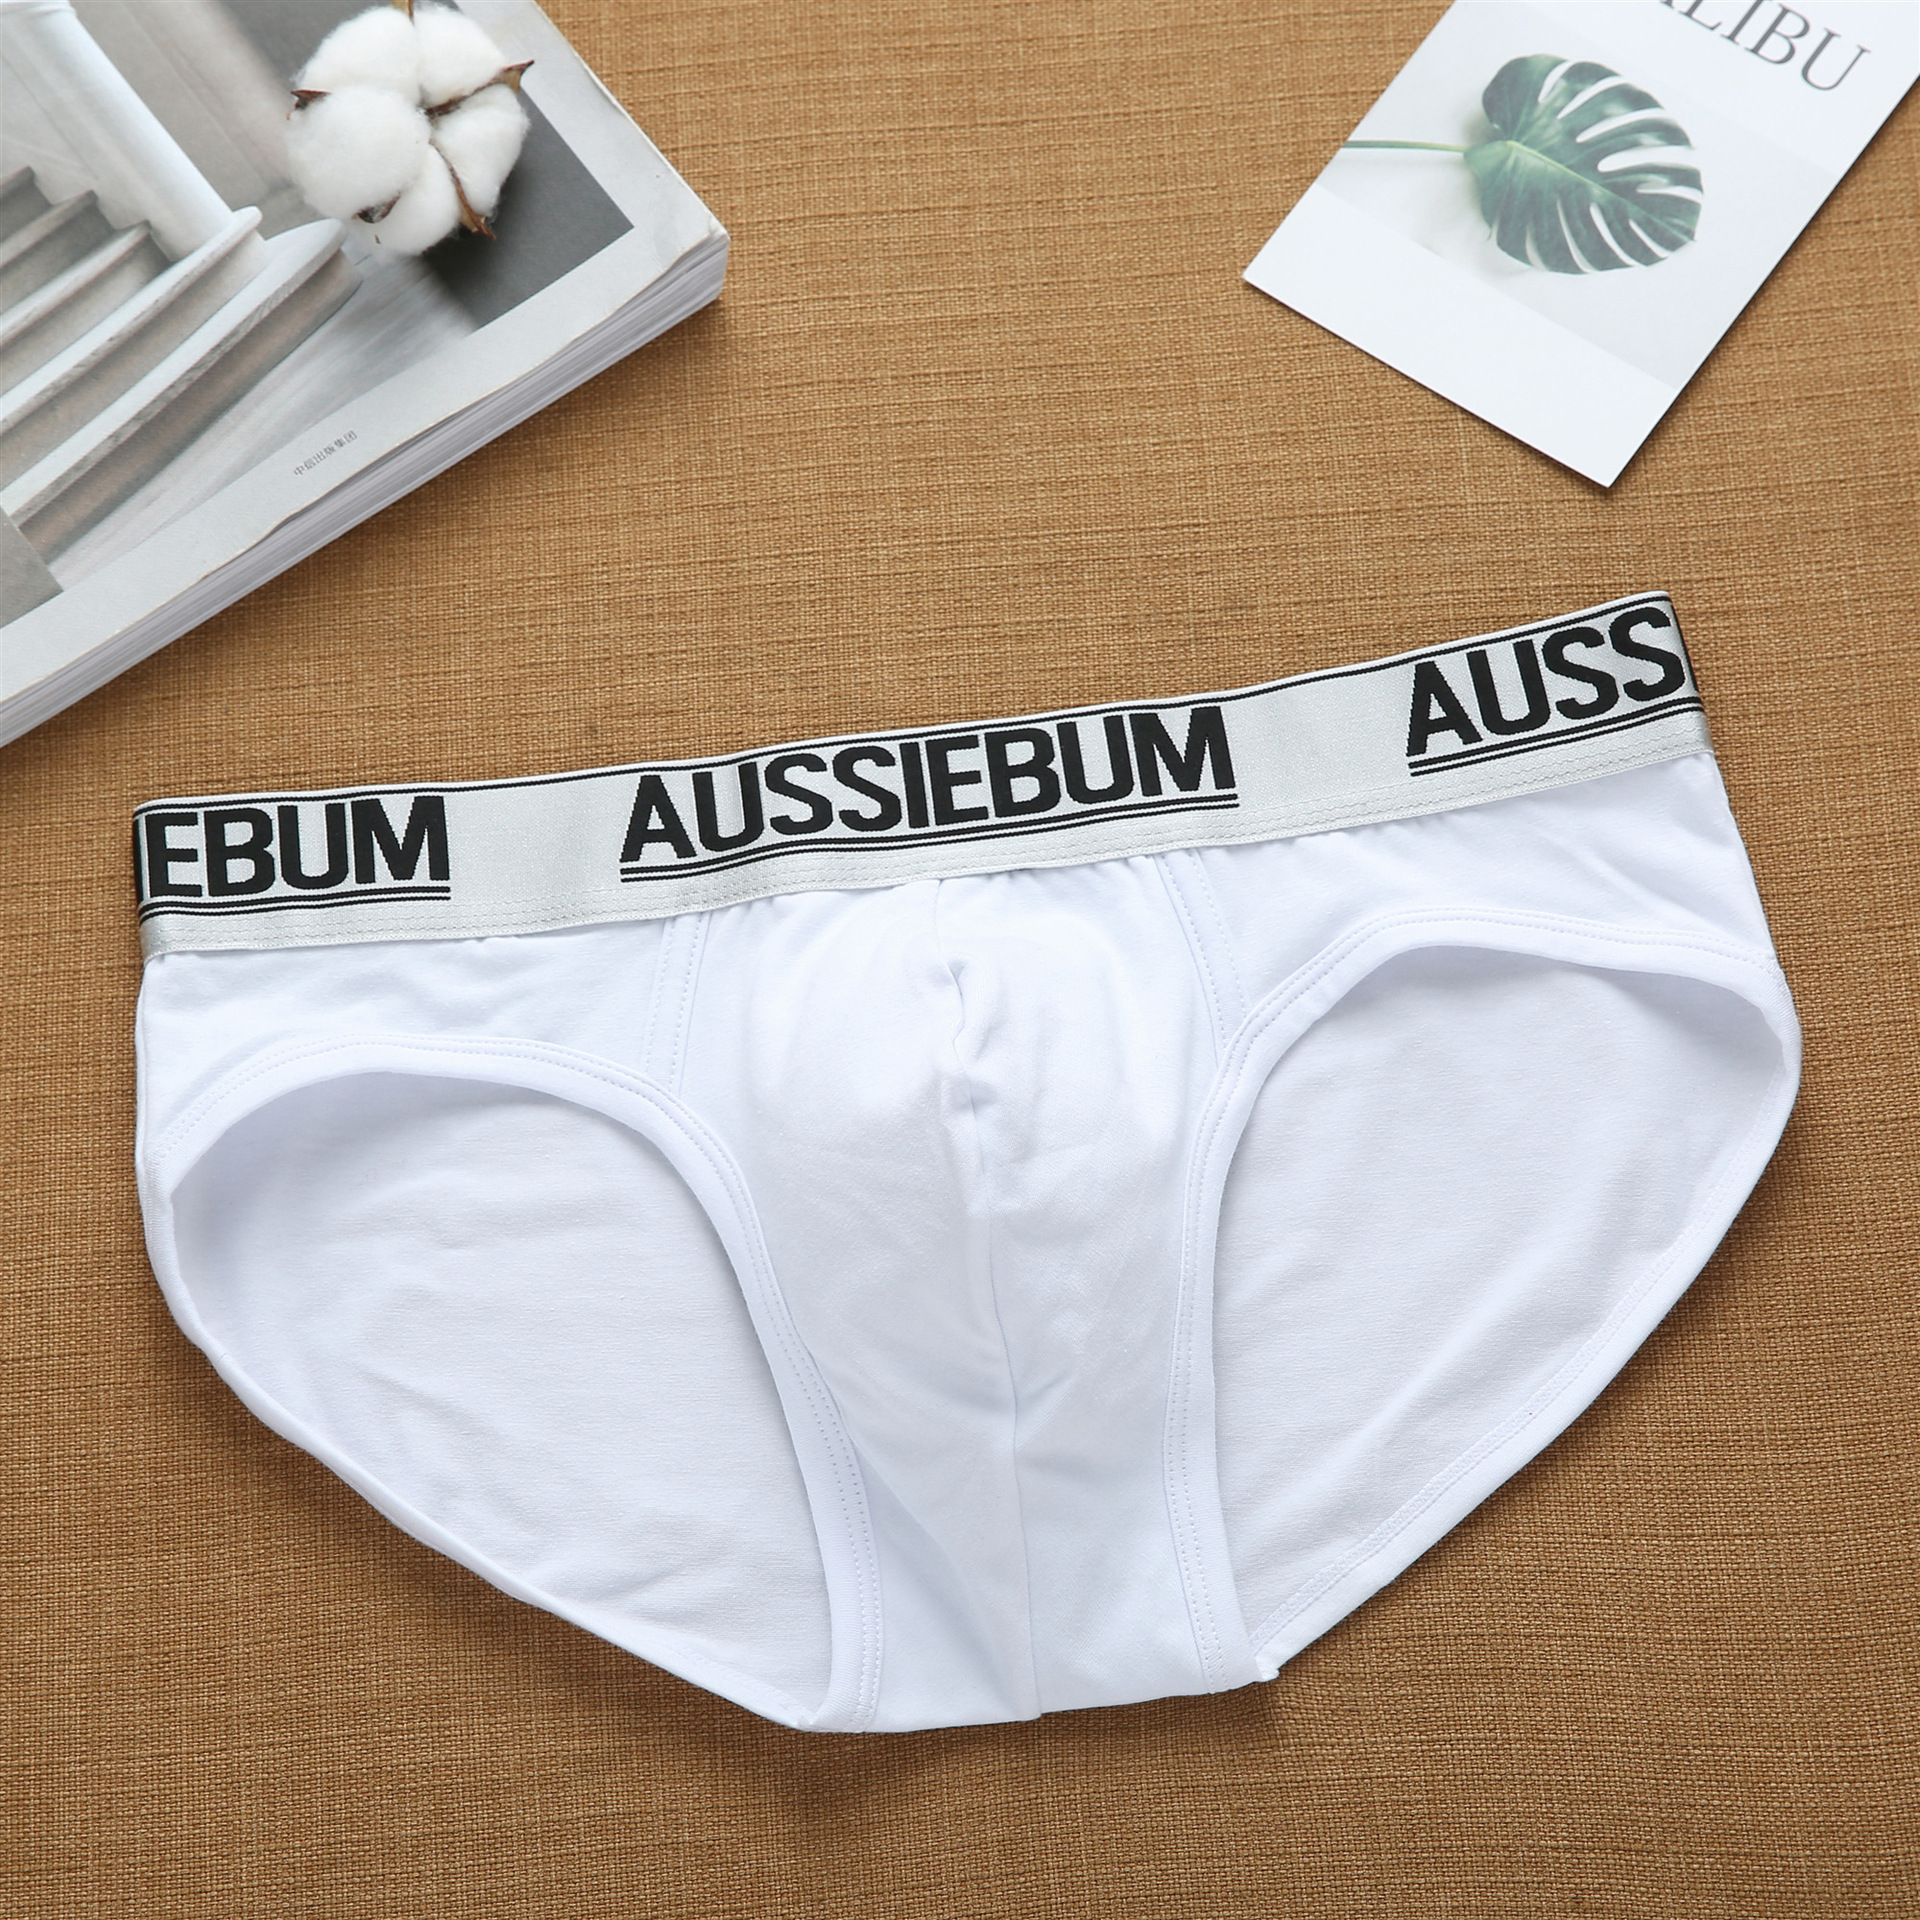 Aussiebum men's cotton comfortable low waist elastic tide letter briefs youth underwear 2